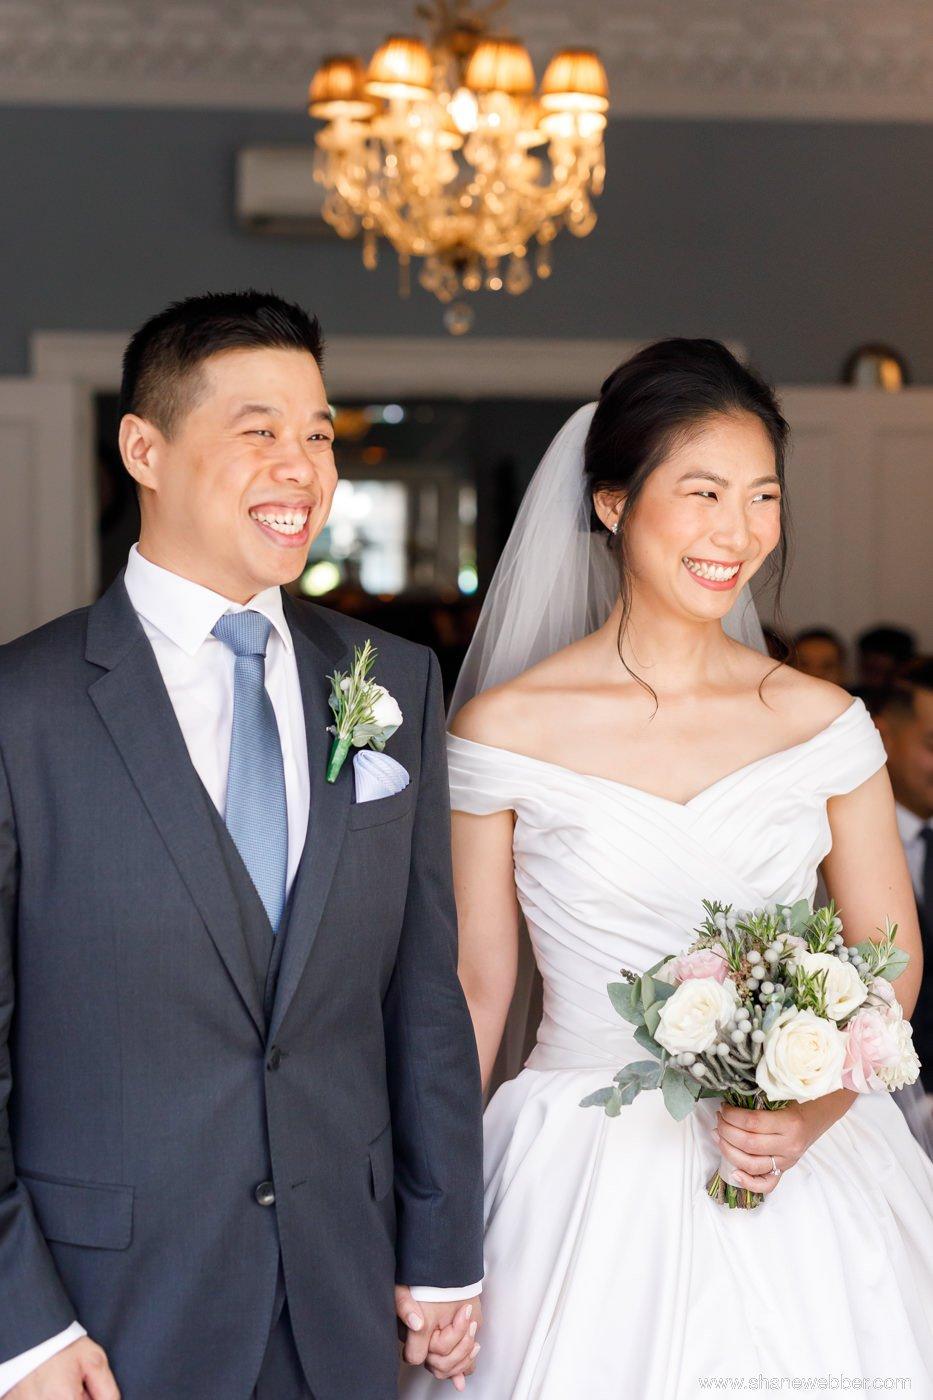 Didsbury House wedding ceremony